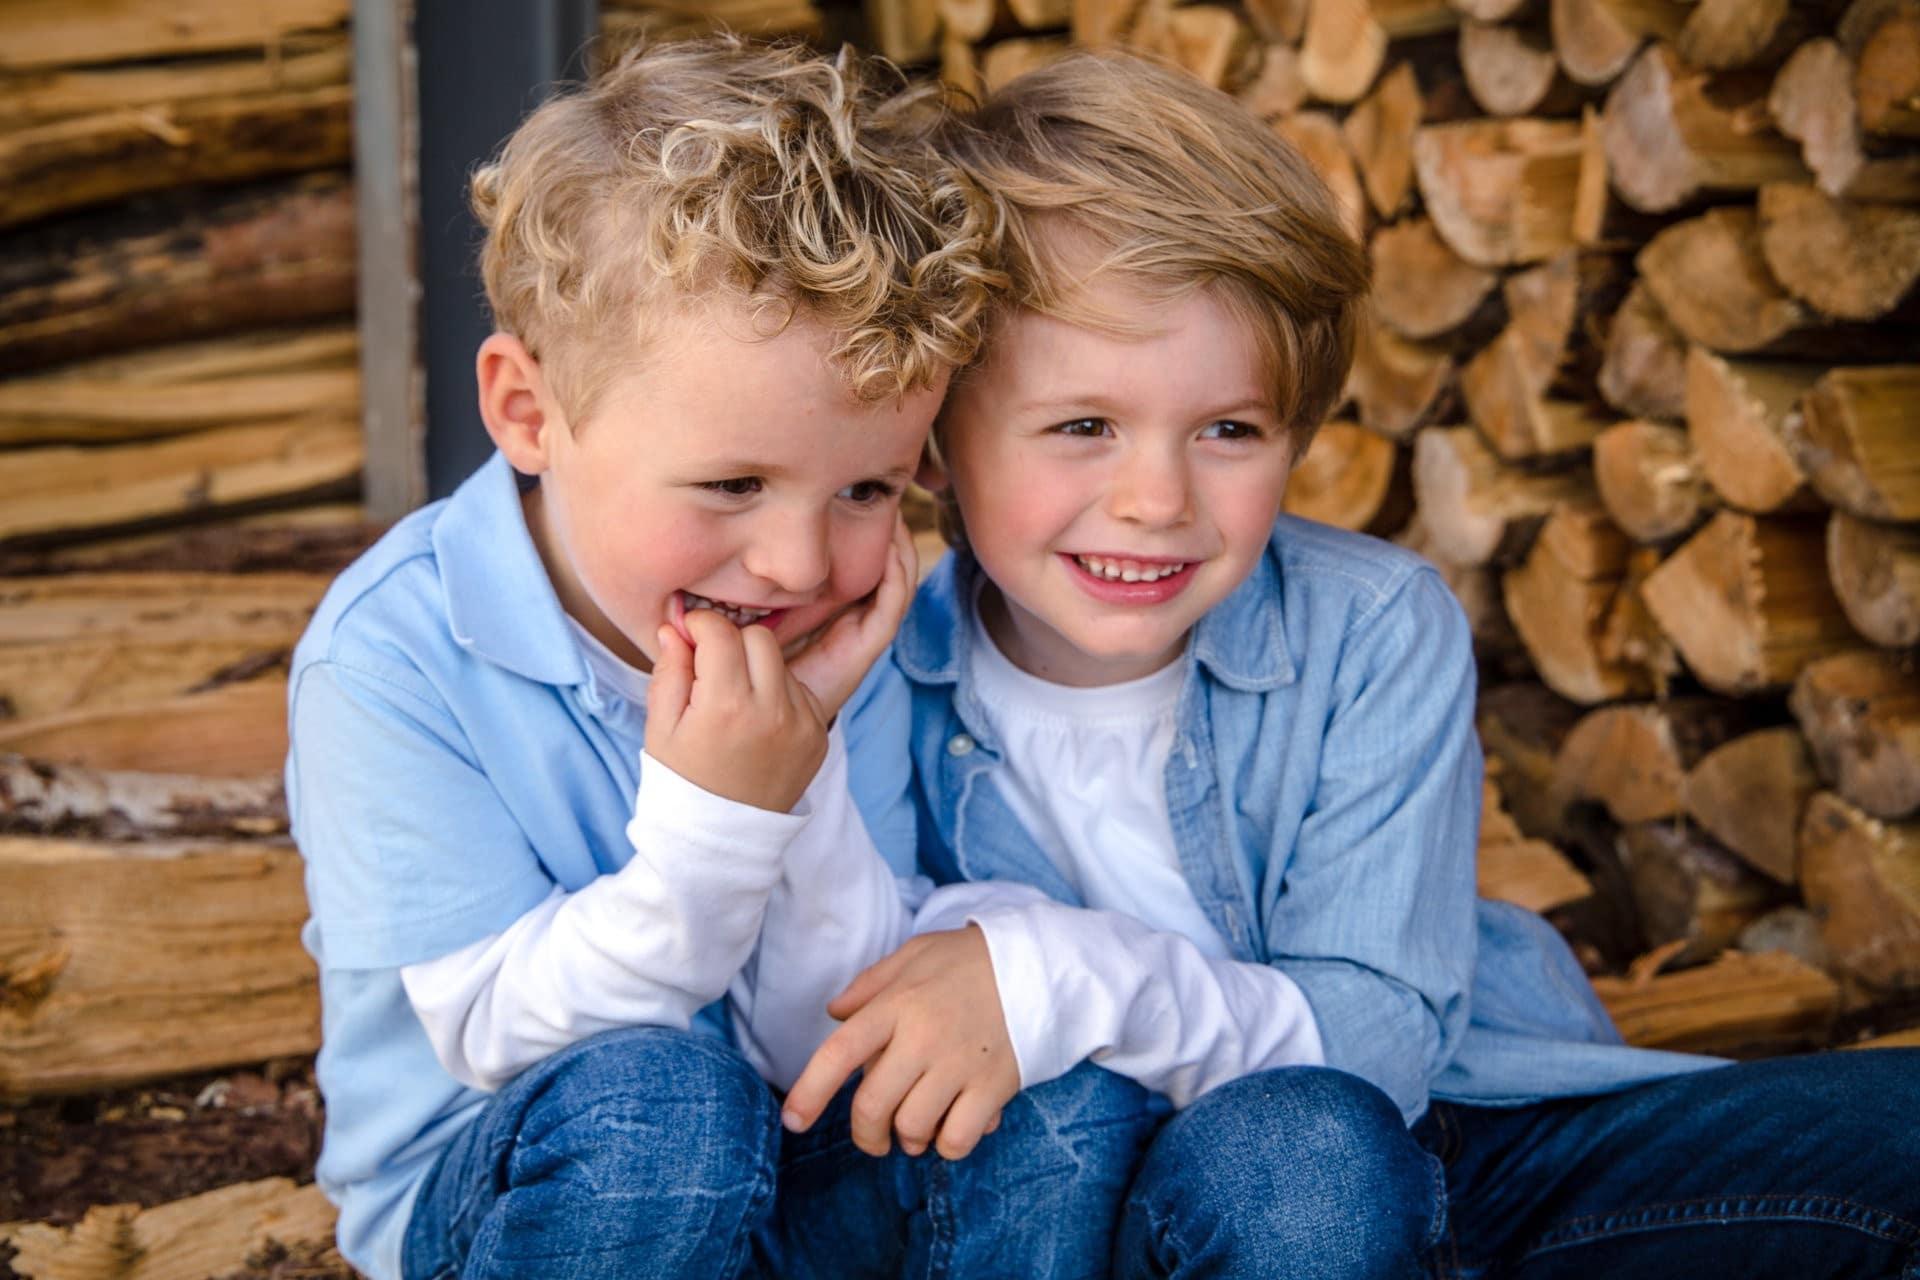 81-Kerstin-Jakobs-Fotografie-Kinderbilder-dMoKUUA0 (1)